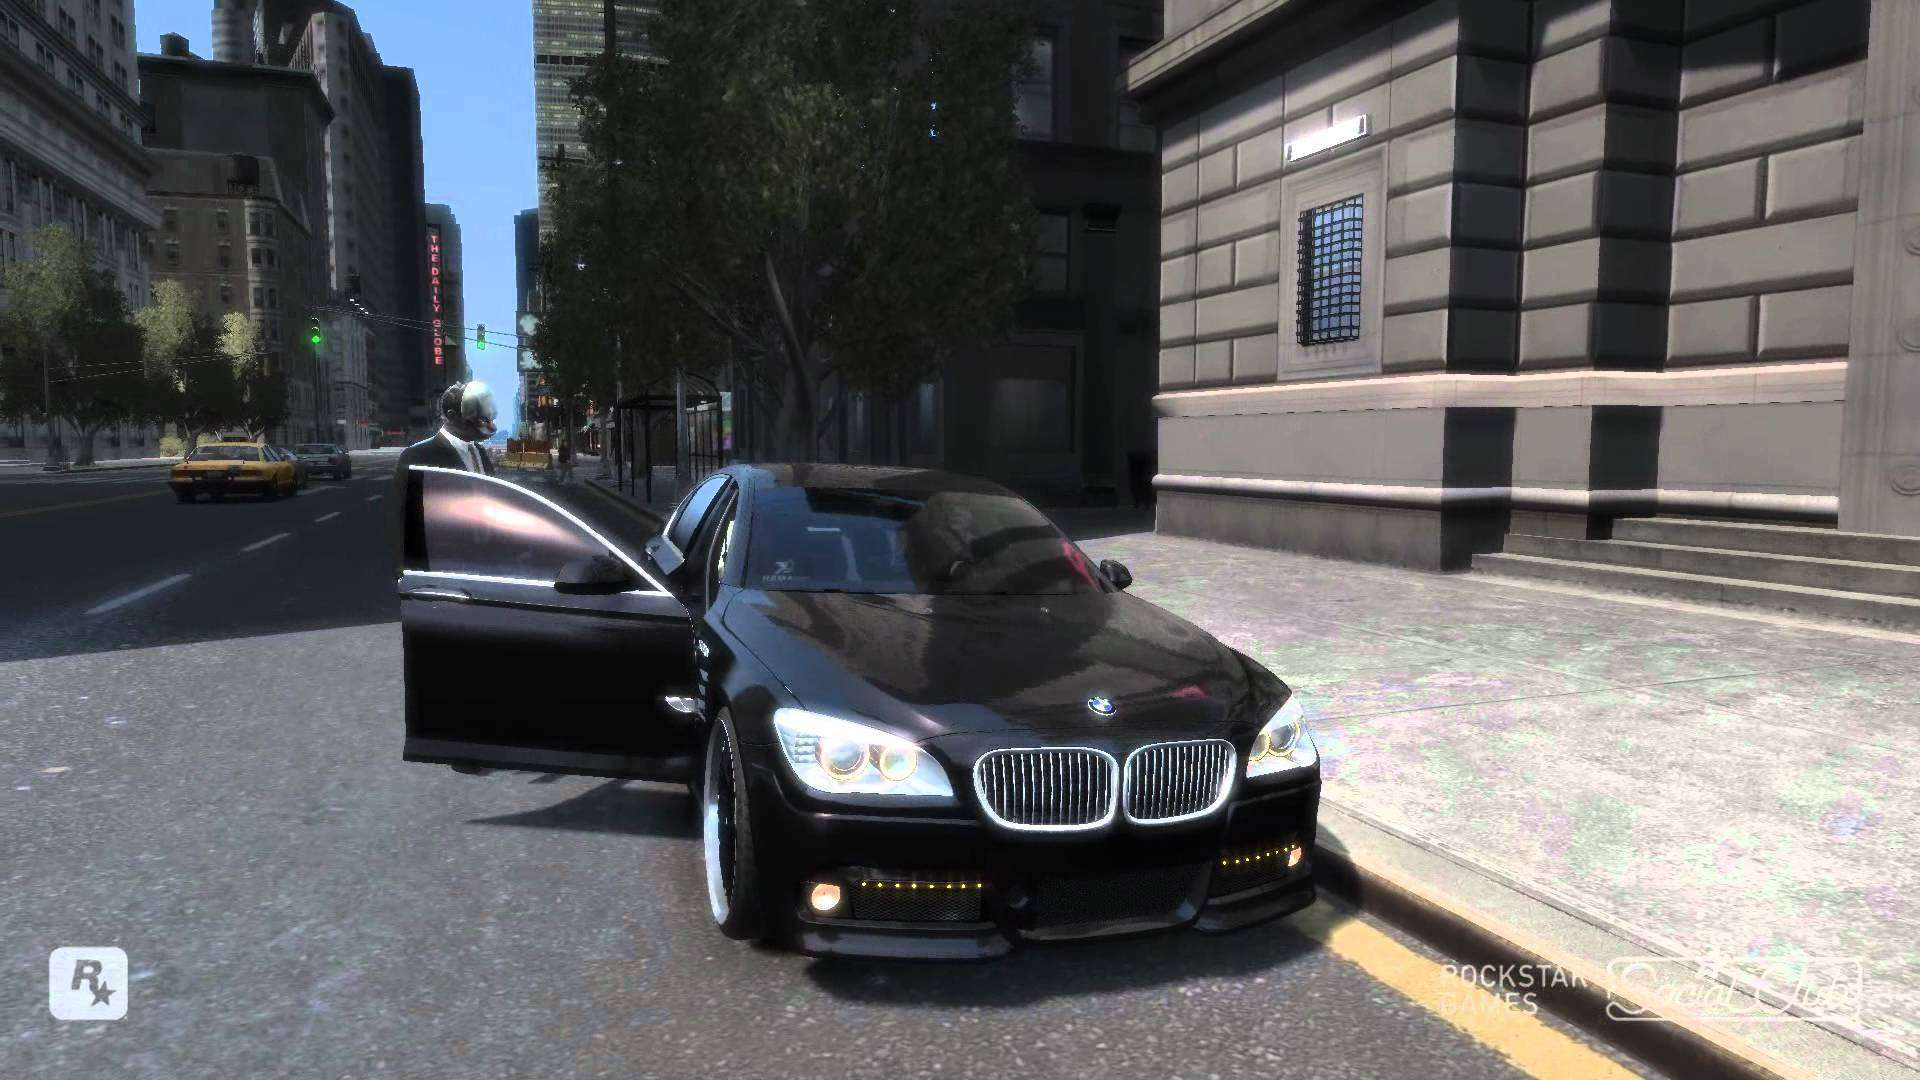 Game Grand Theft Auto V Wallpaper 021